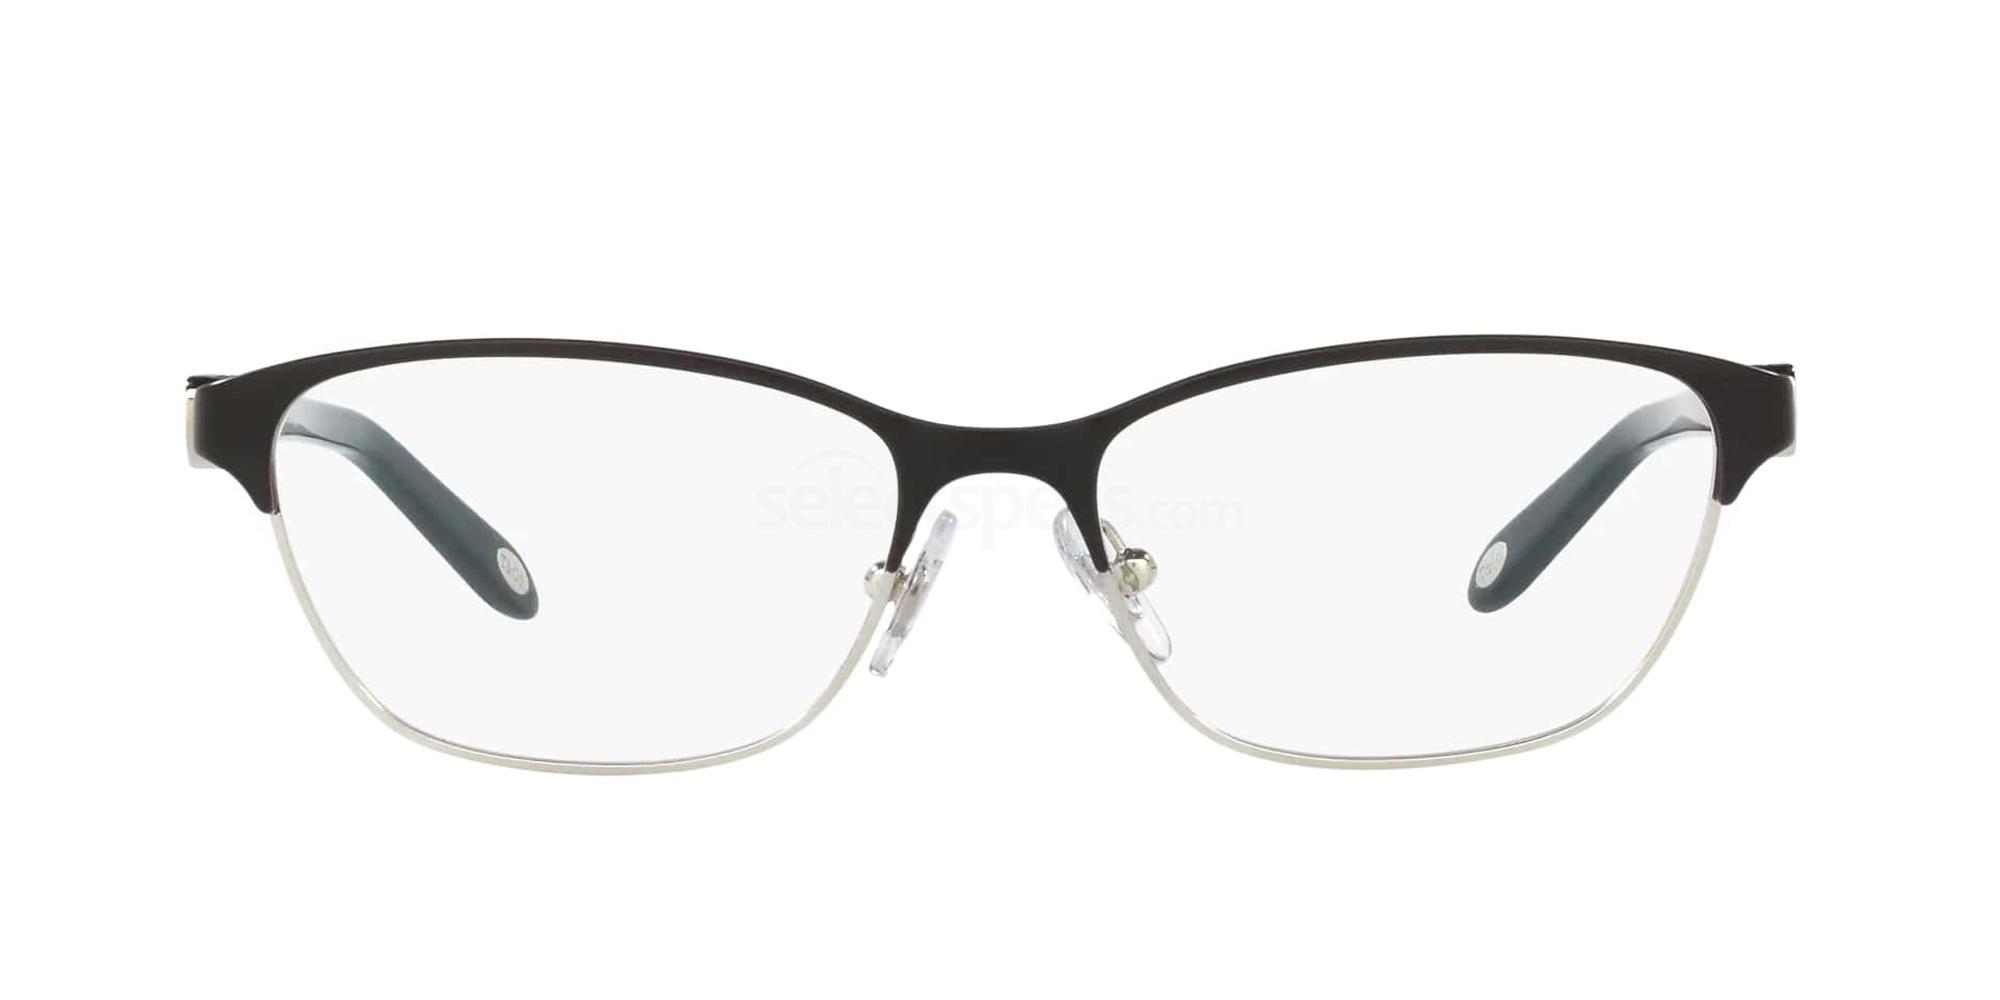 6107 TF1072 Glasses, Tiffany & Co.